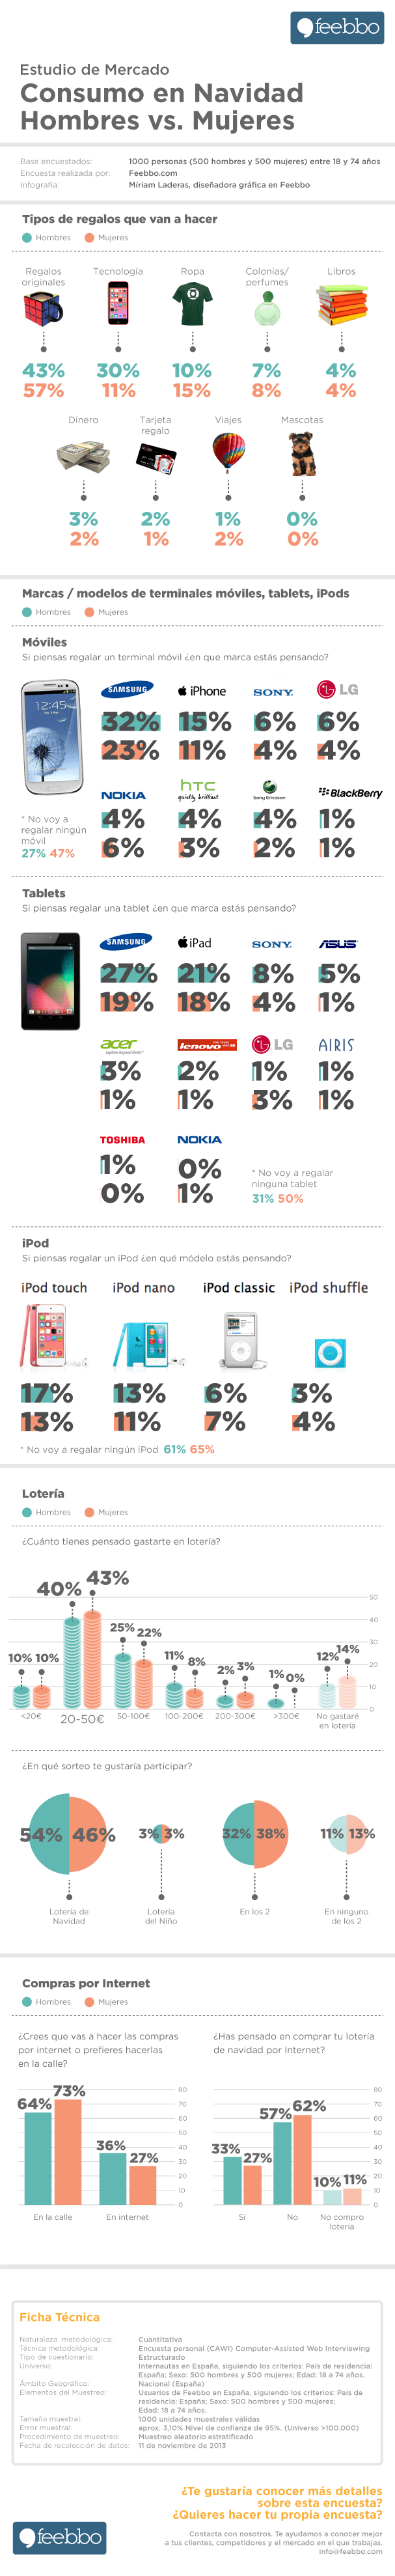 infografia-Feebbo-Consumo-Navidad